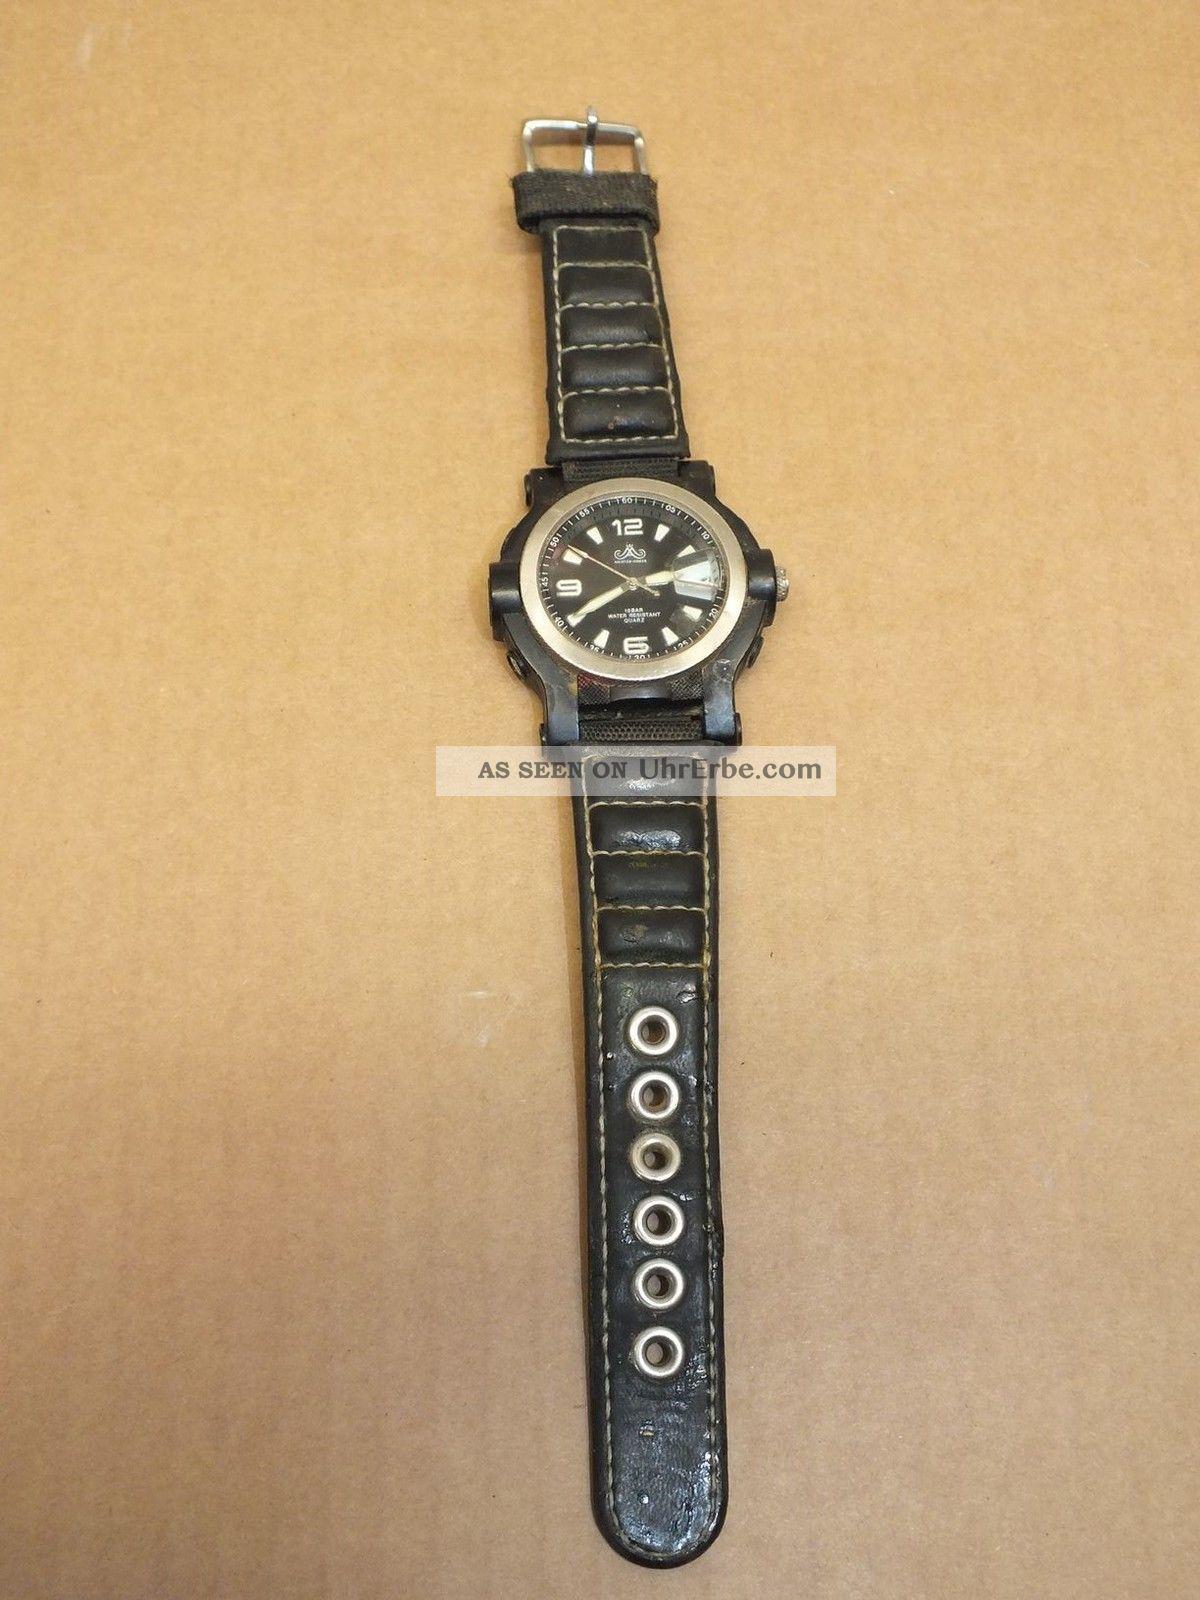 Meister Anker Herrenarmbanduhr,  Kunststoffgehäuse,  Lederarmband,  Datumsanz. Armbanduhren Bild